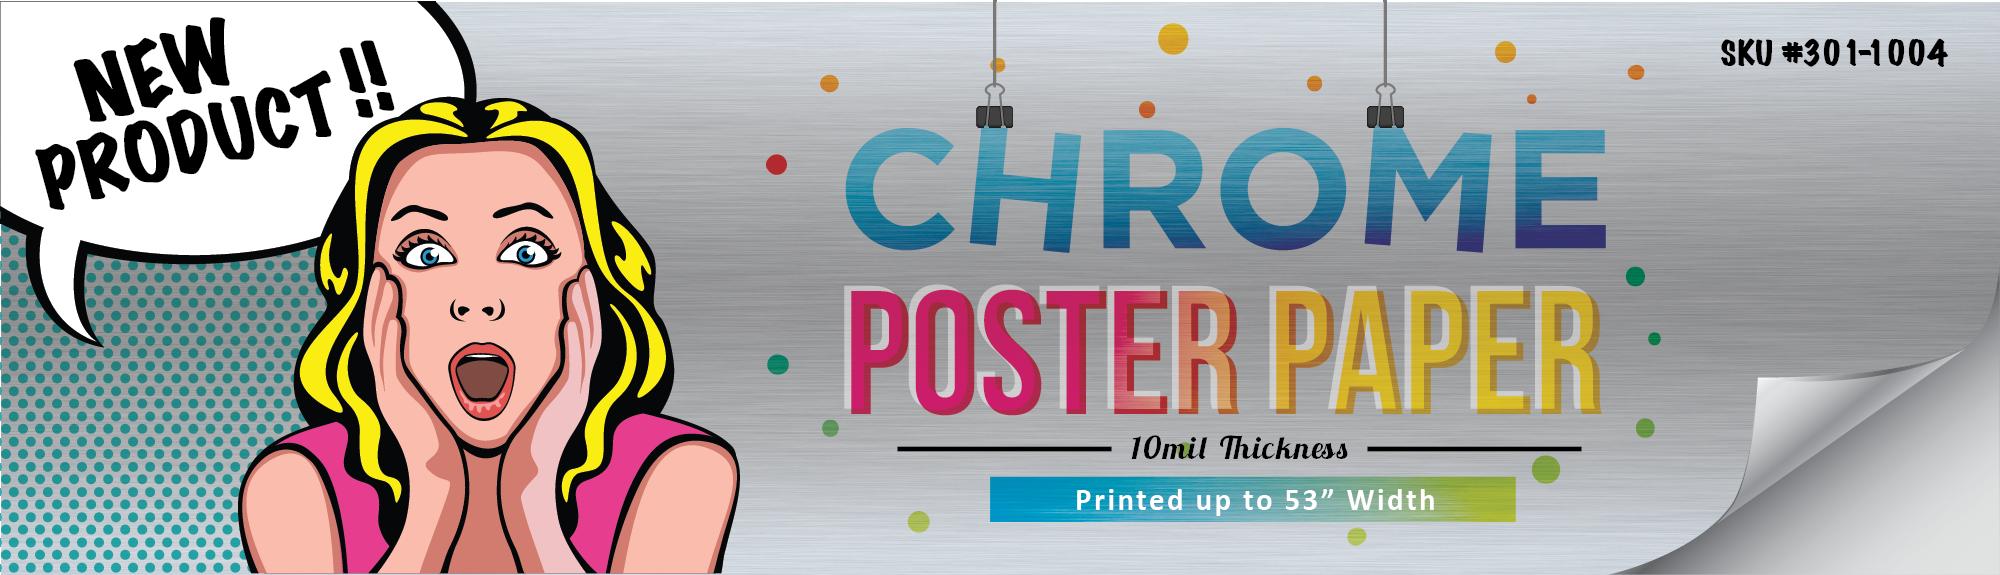 Chrome Poster Paper